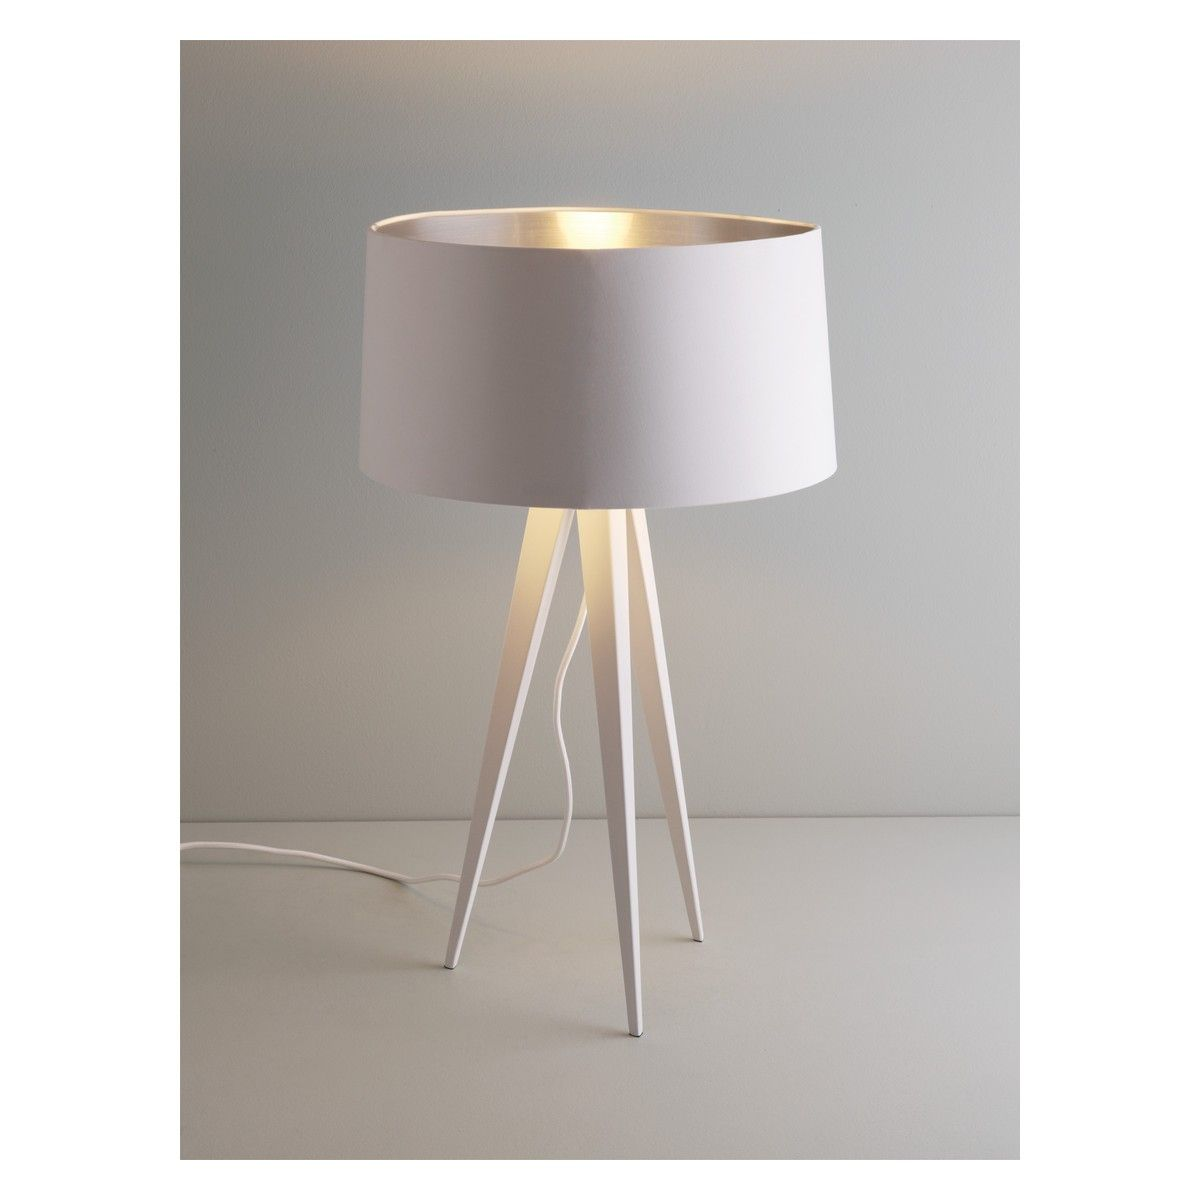 Yves white metal tripod table lamp base tripod table lamp table yves white metal tripod table lamp base geotapseo Images